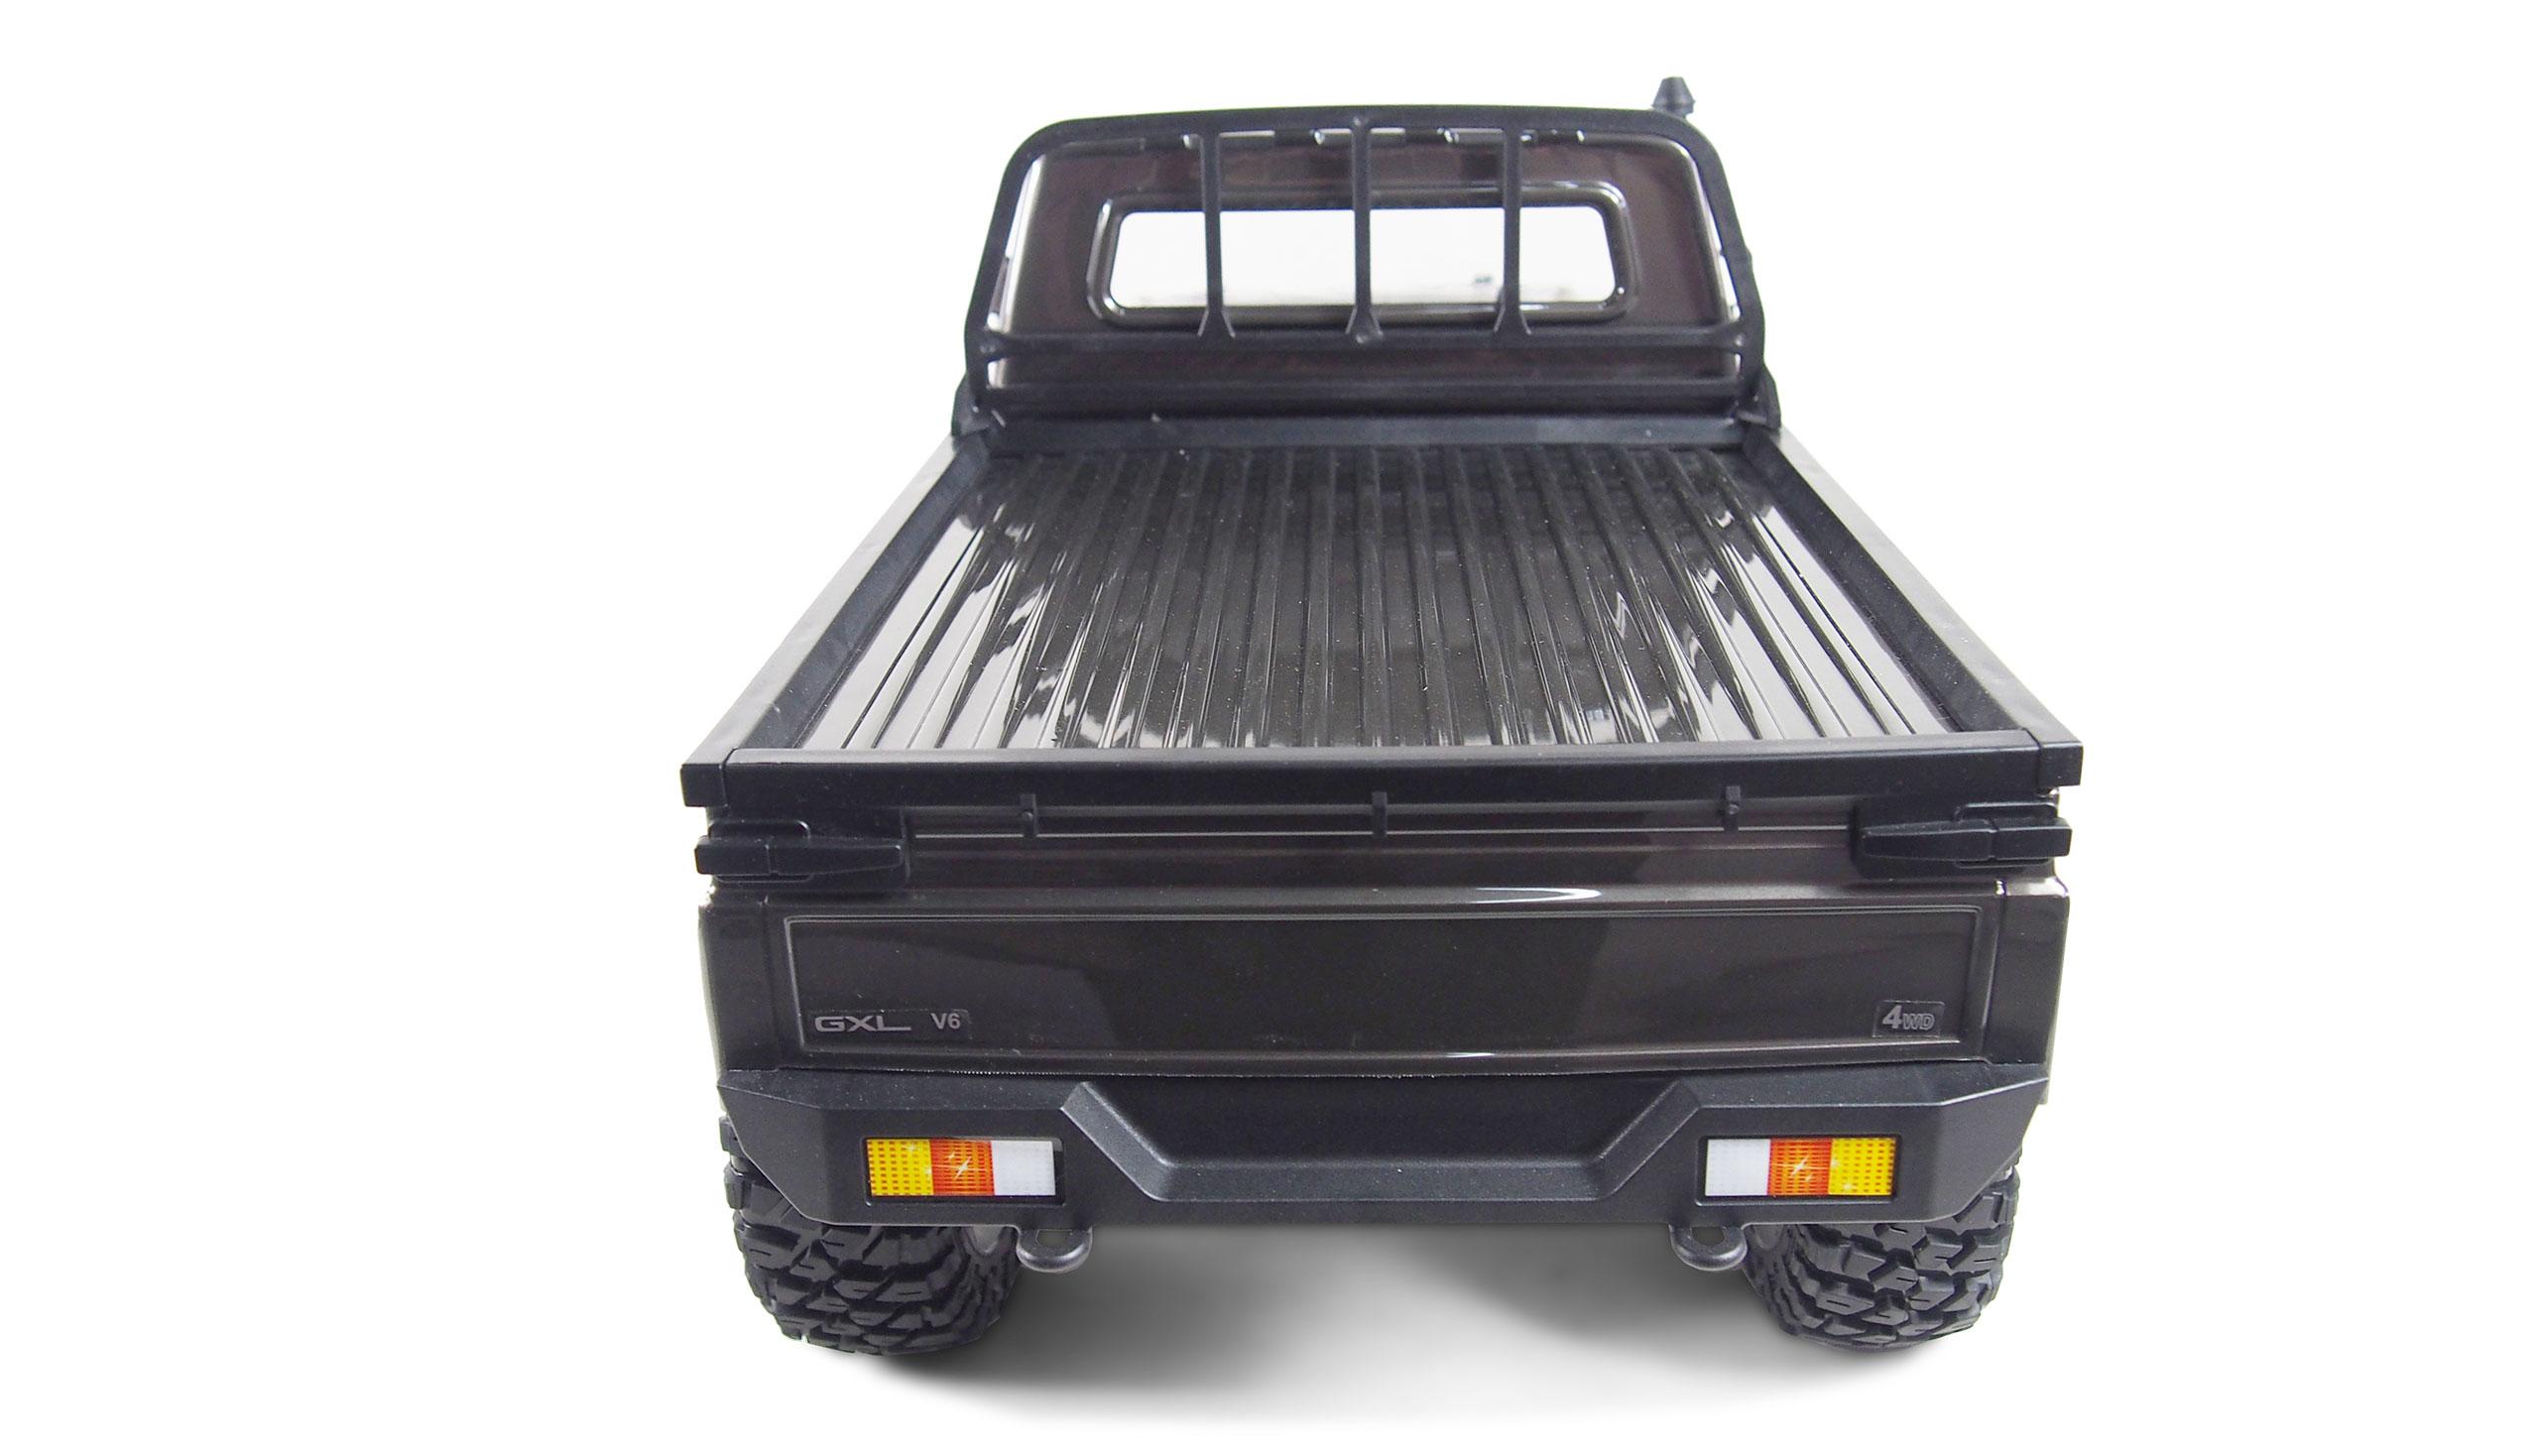 Amewi AMXRock RCX10B Scale Crawler - Raupenfahrzeug - Elektromotor - 1:10 - Fahrbereit (RTD) - Schwarz - Grau - Aluminium - Metall